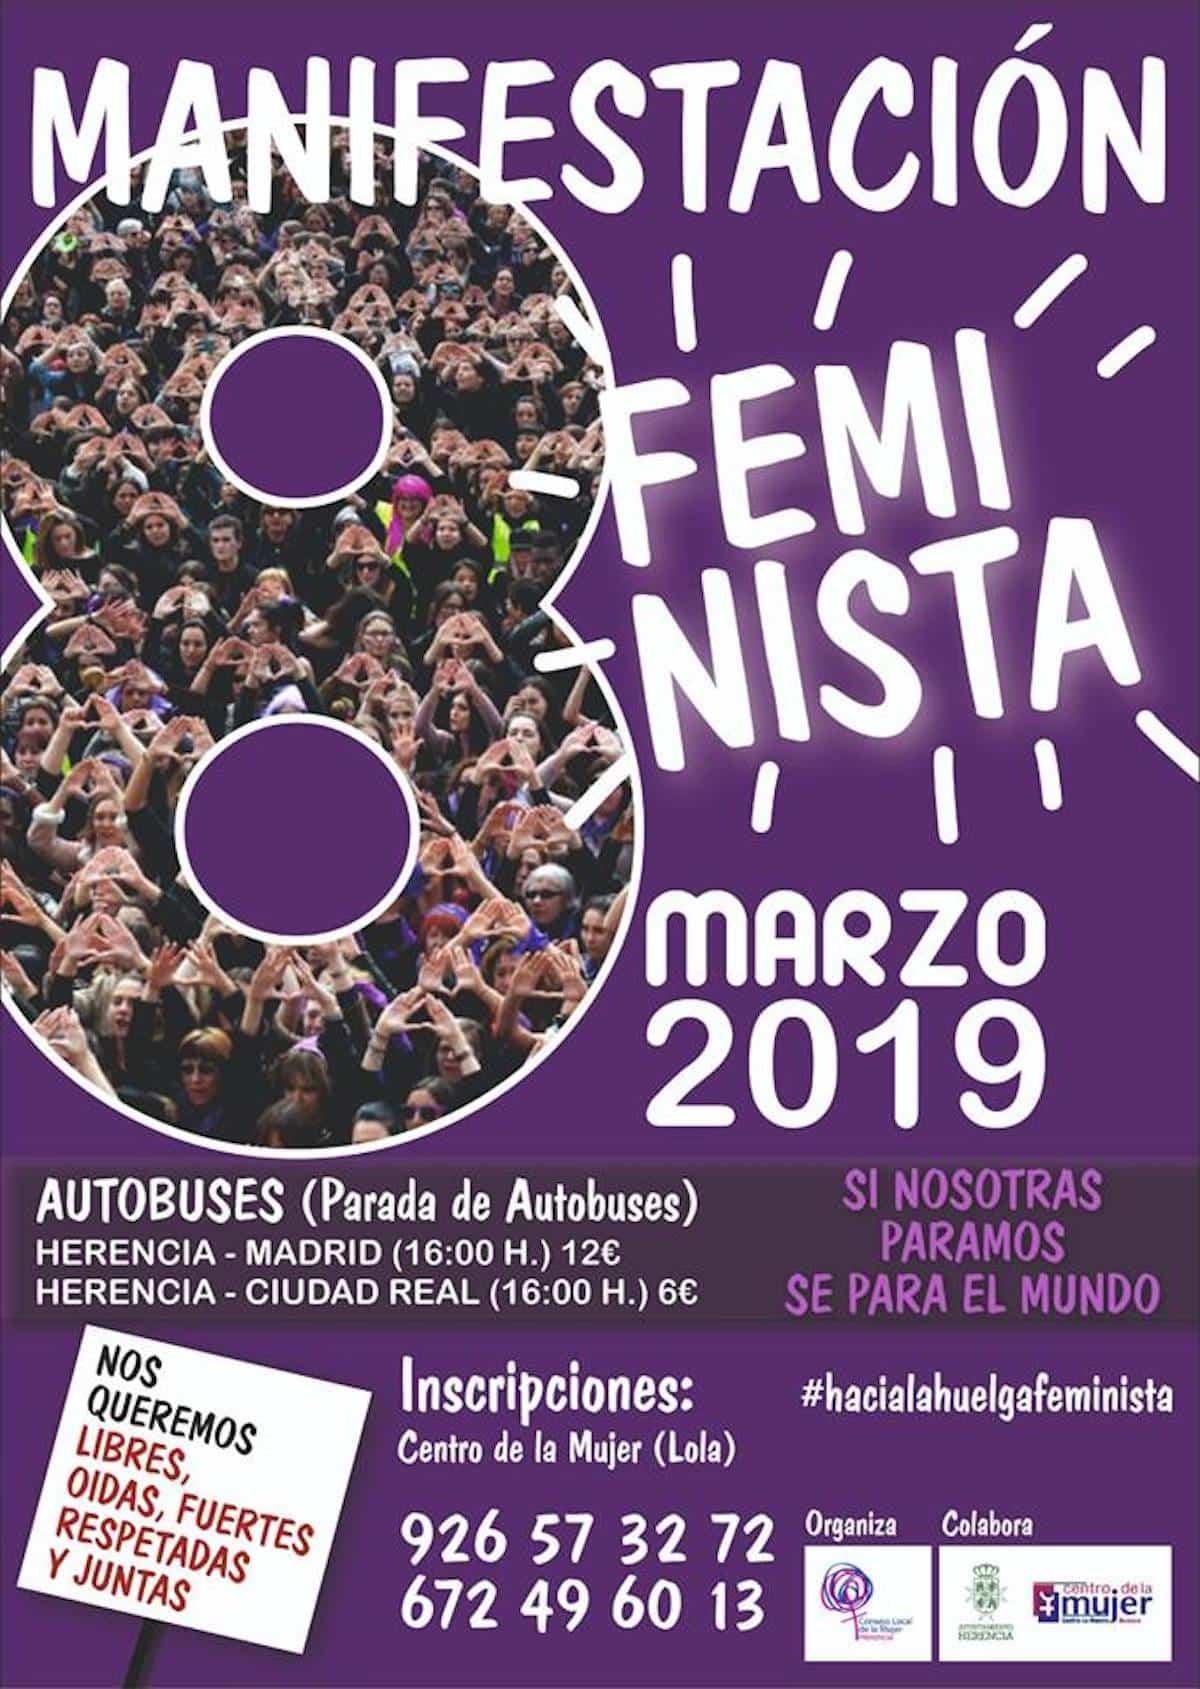 manifestacion feminista madrid - Huelga Feminista el 8 de marzo en Herencia